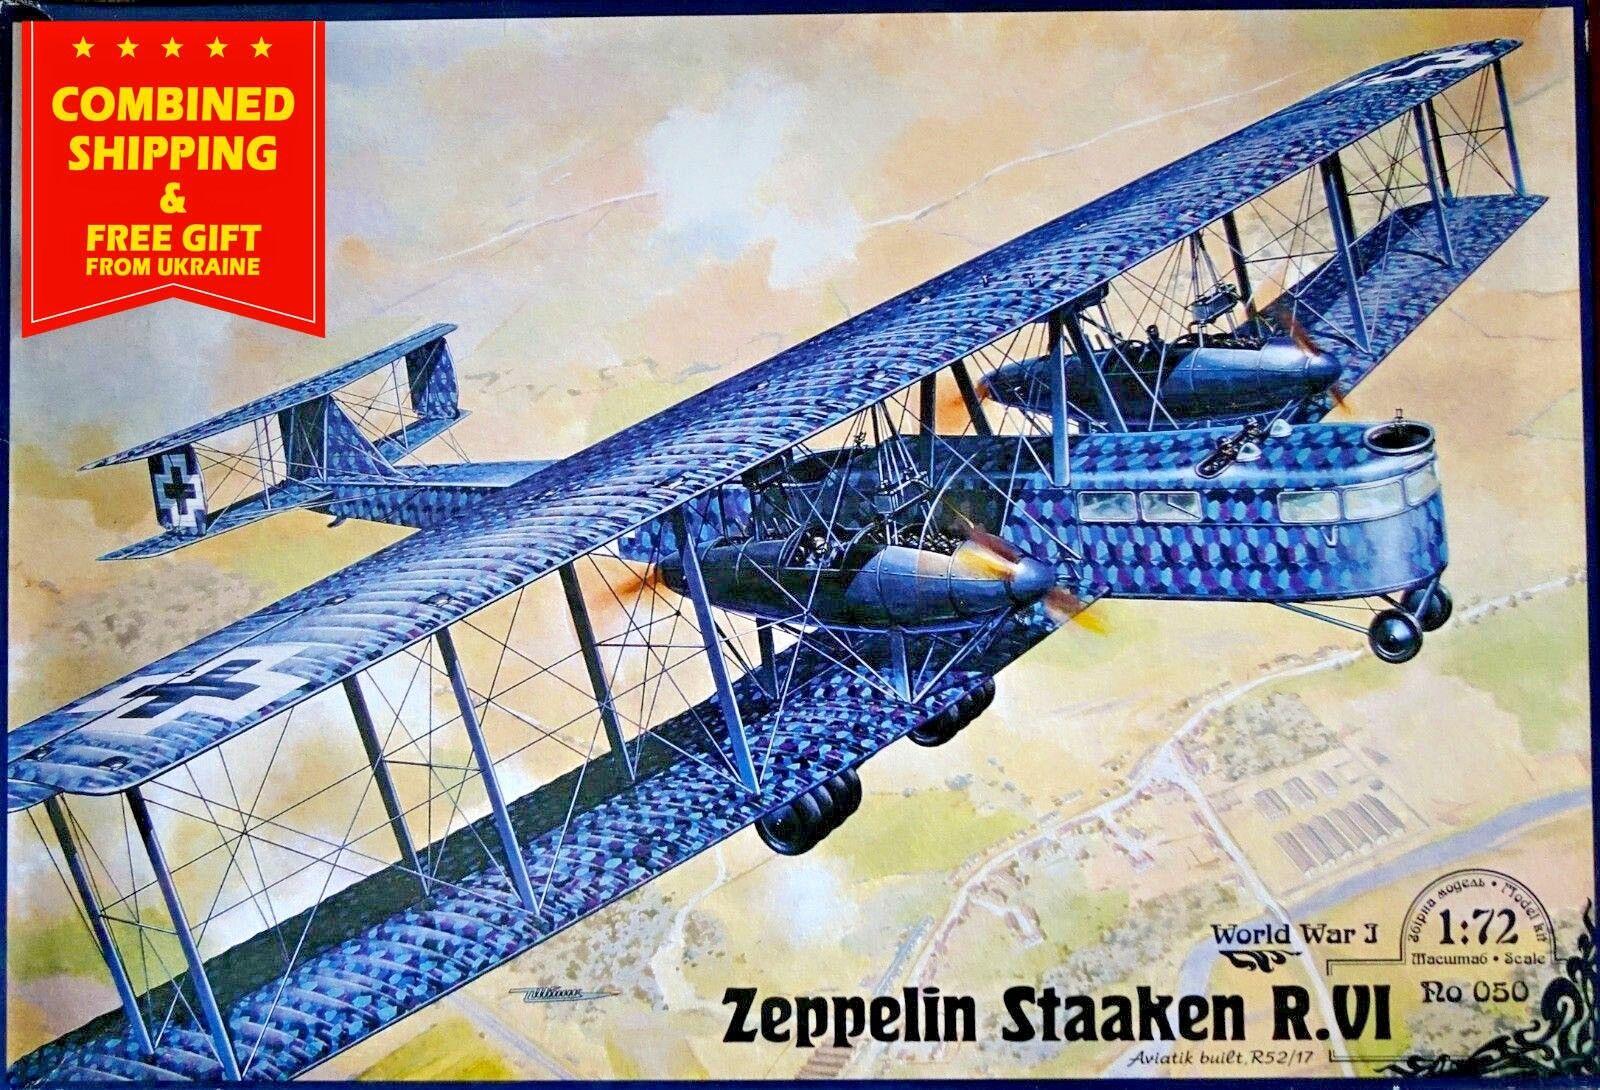 ZEPPELIN STAAKEN R.VI (AVIATIK, 52 17) German Fighter-biplane 1 72 RODEN 050